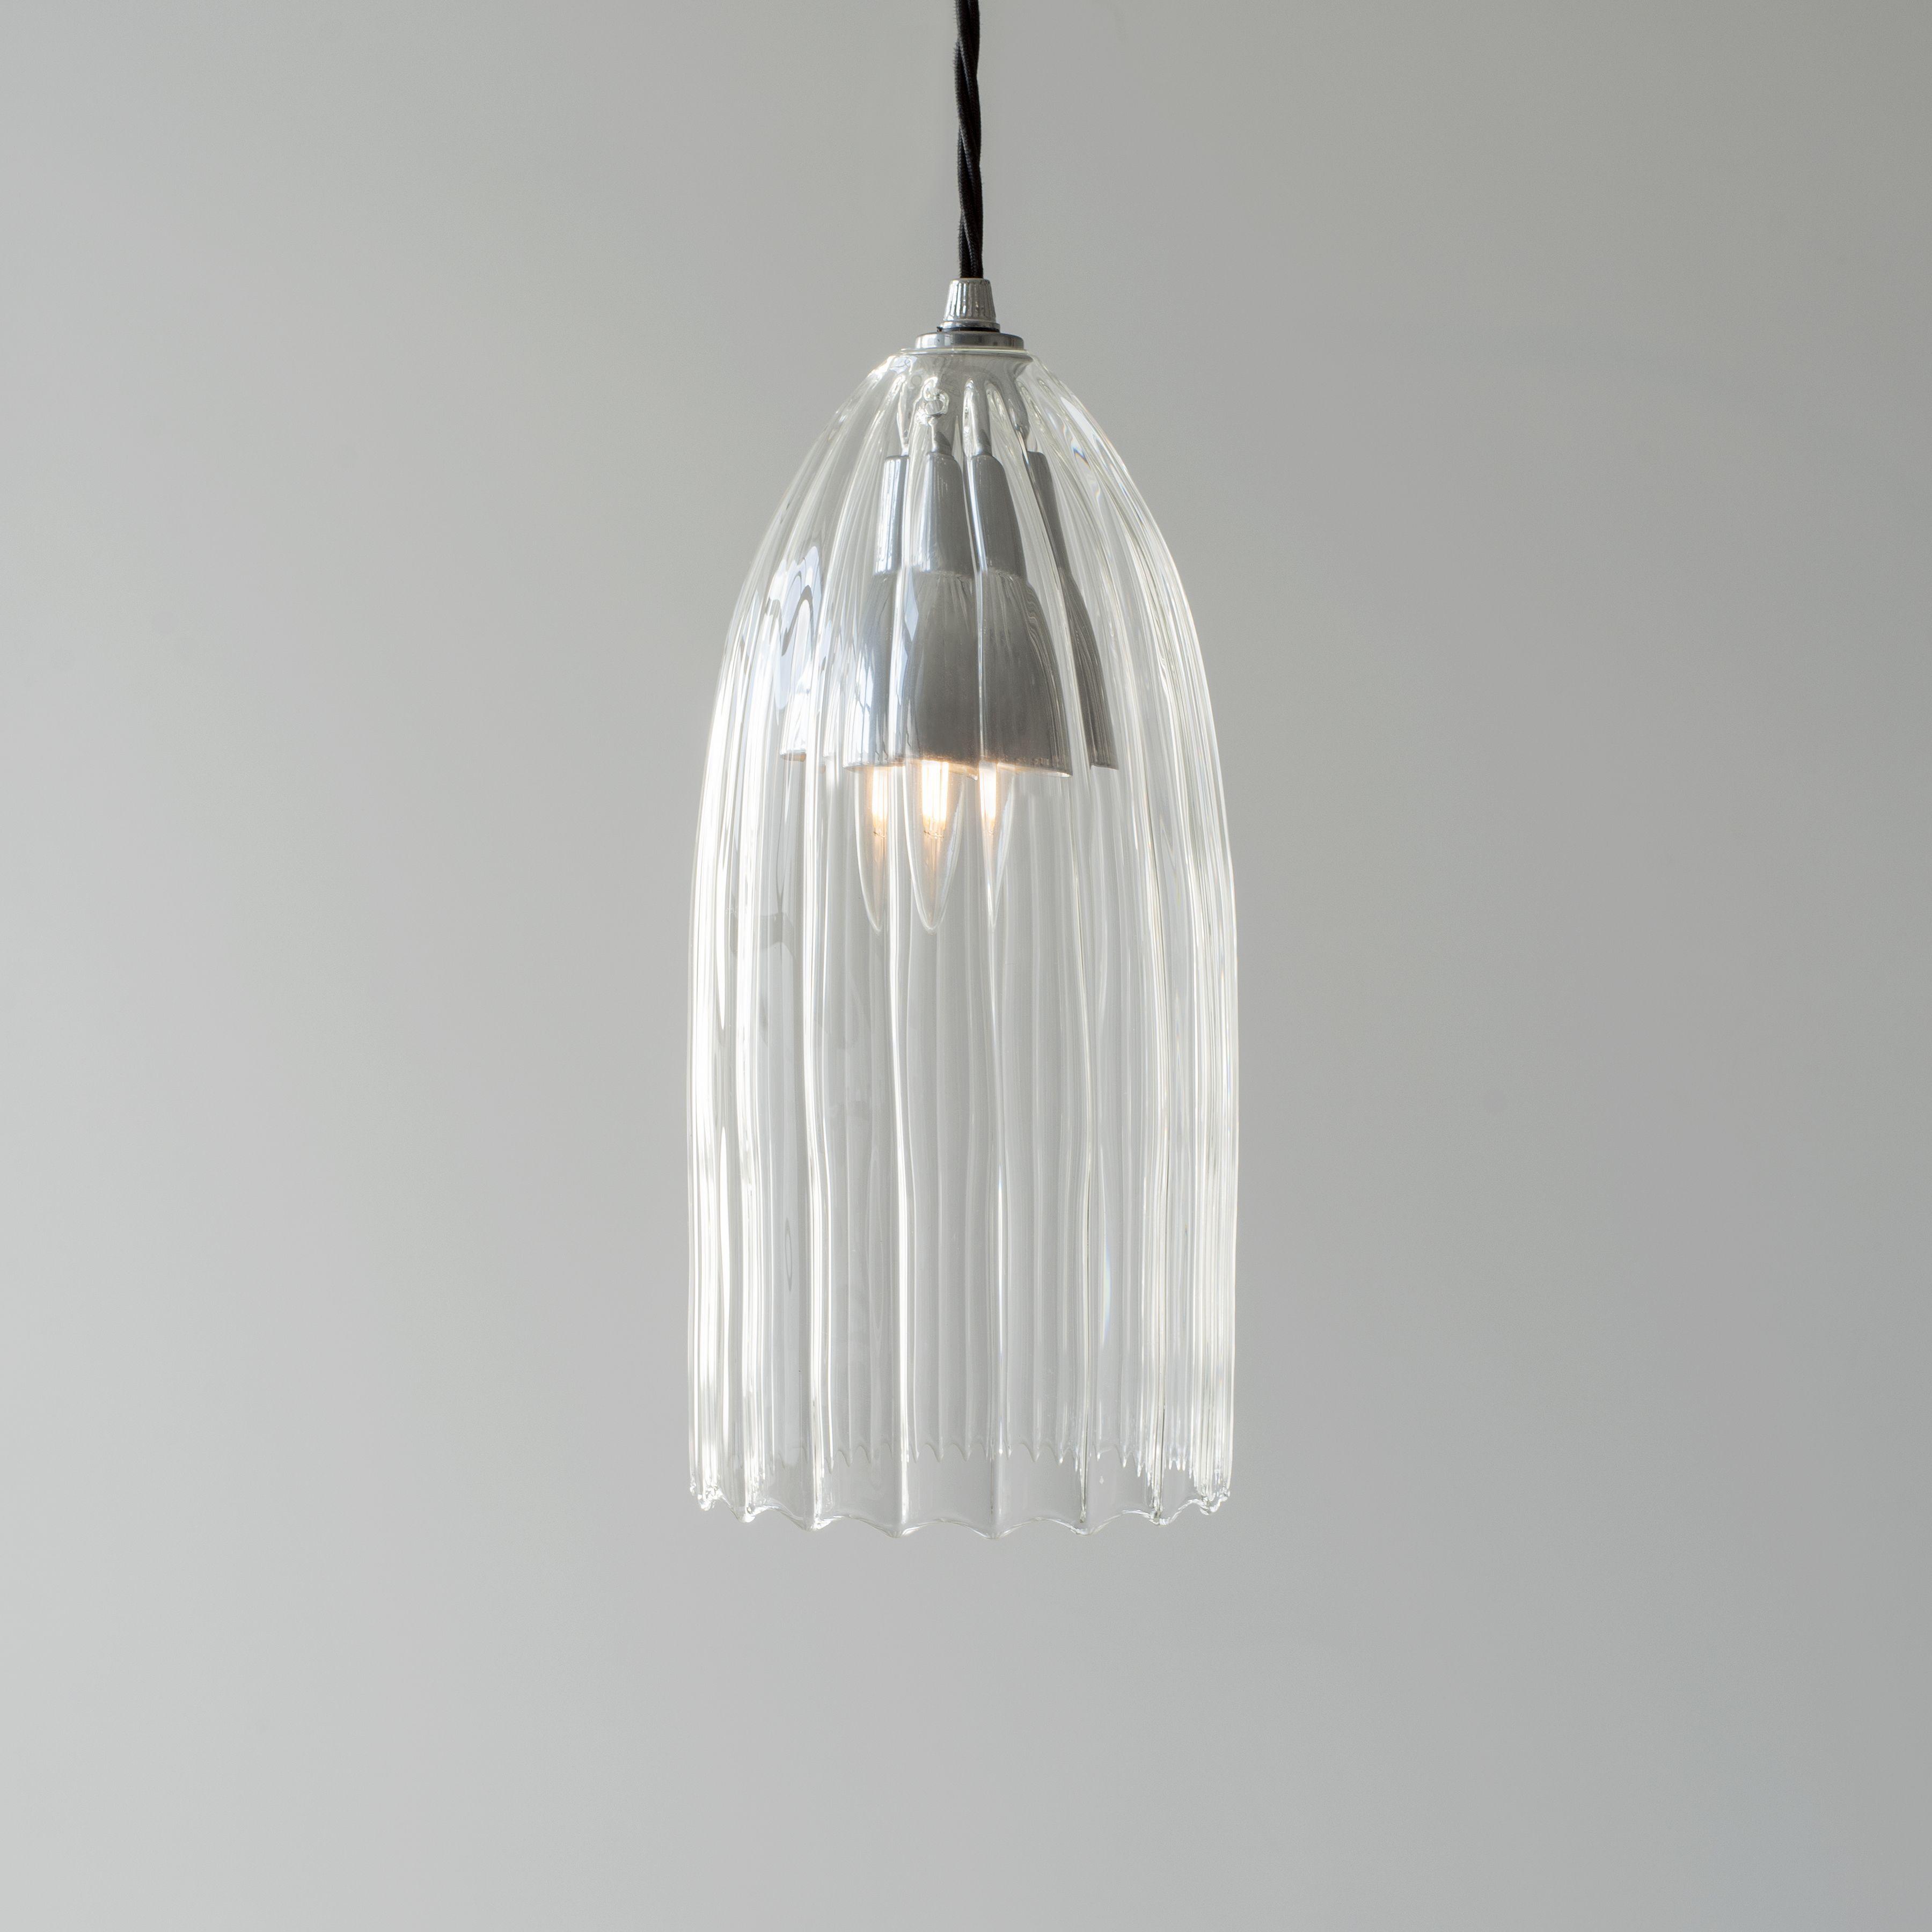 Traditional Pendant Lighting Thornton Glass Pendant Light In Mercury Pendant Light Traditional Pendant Lighting Glass Pendant Light